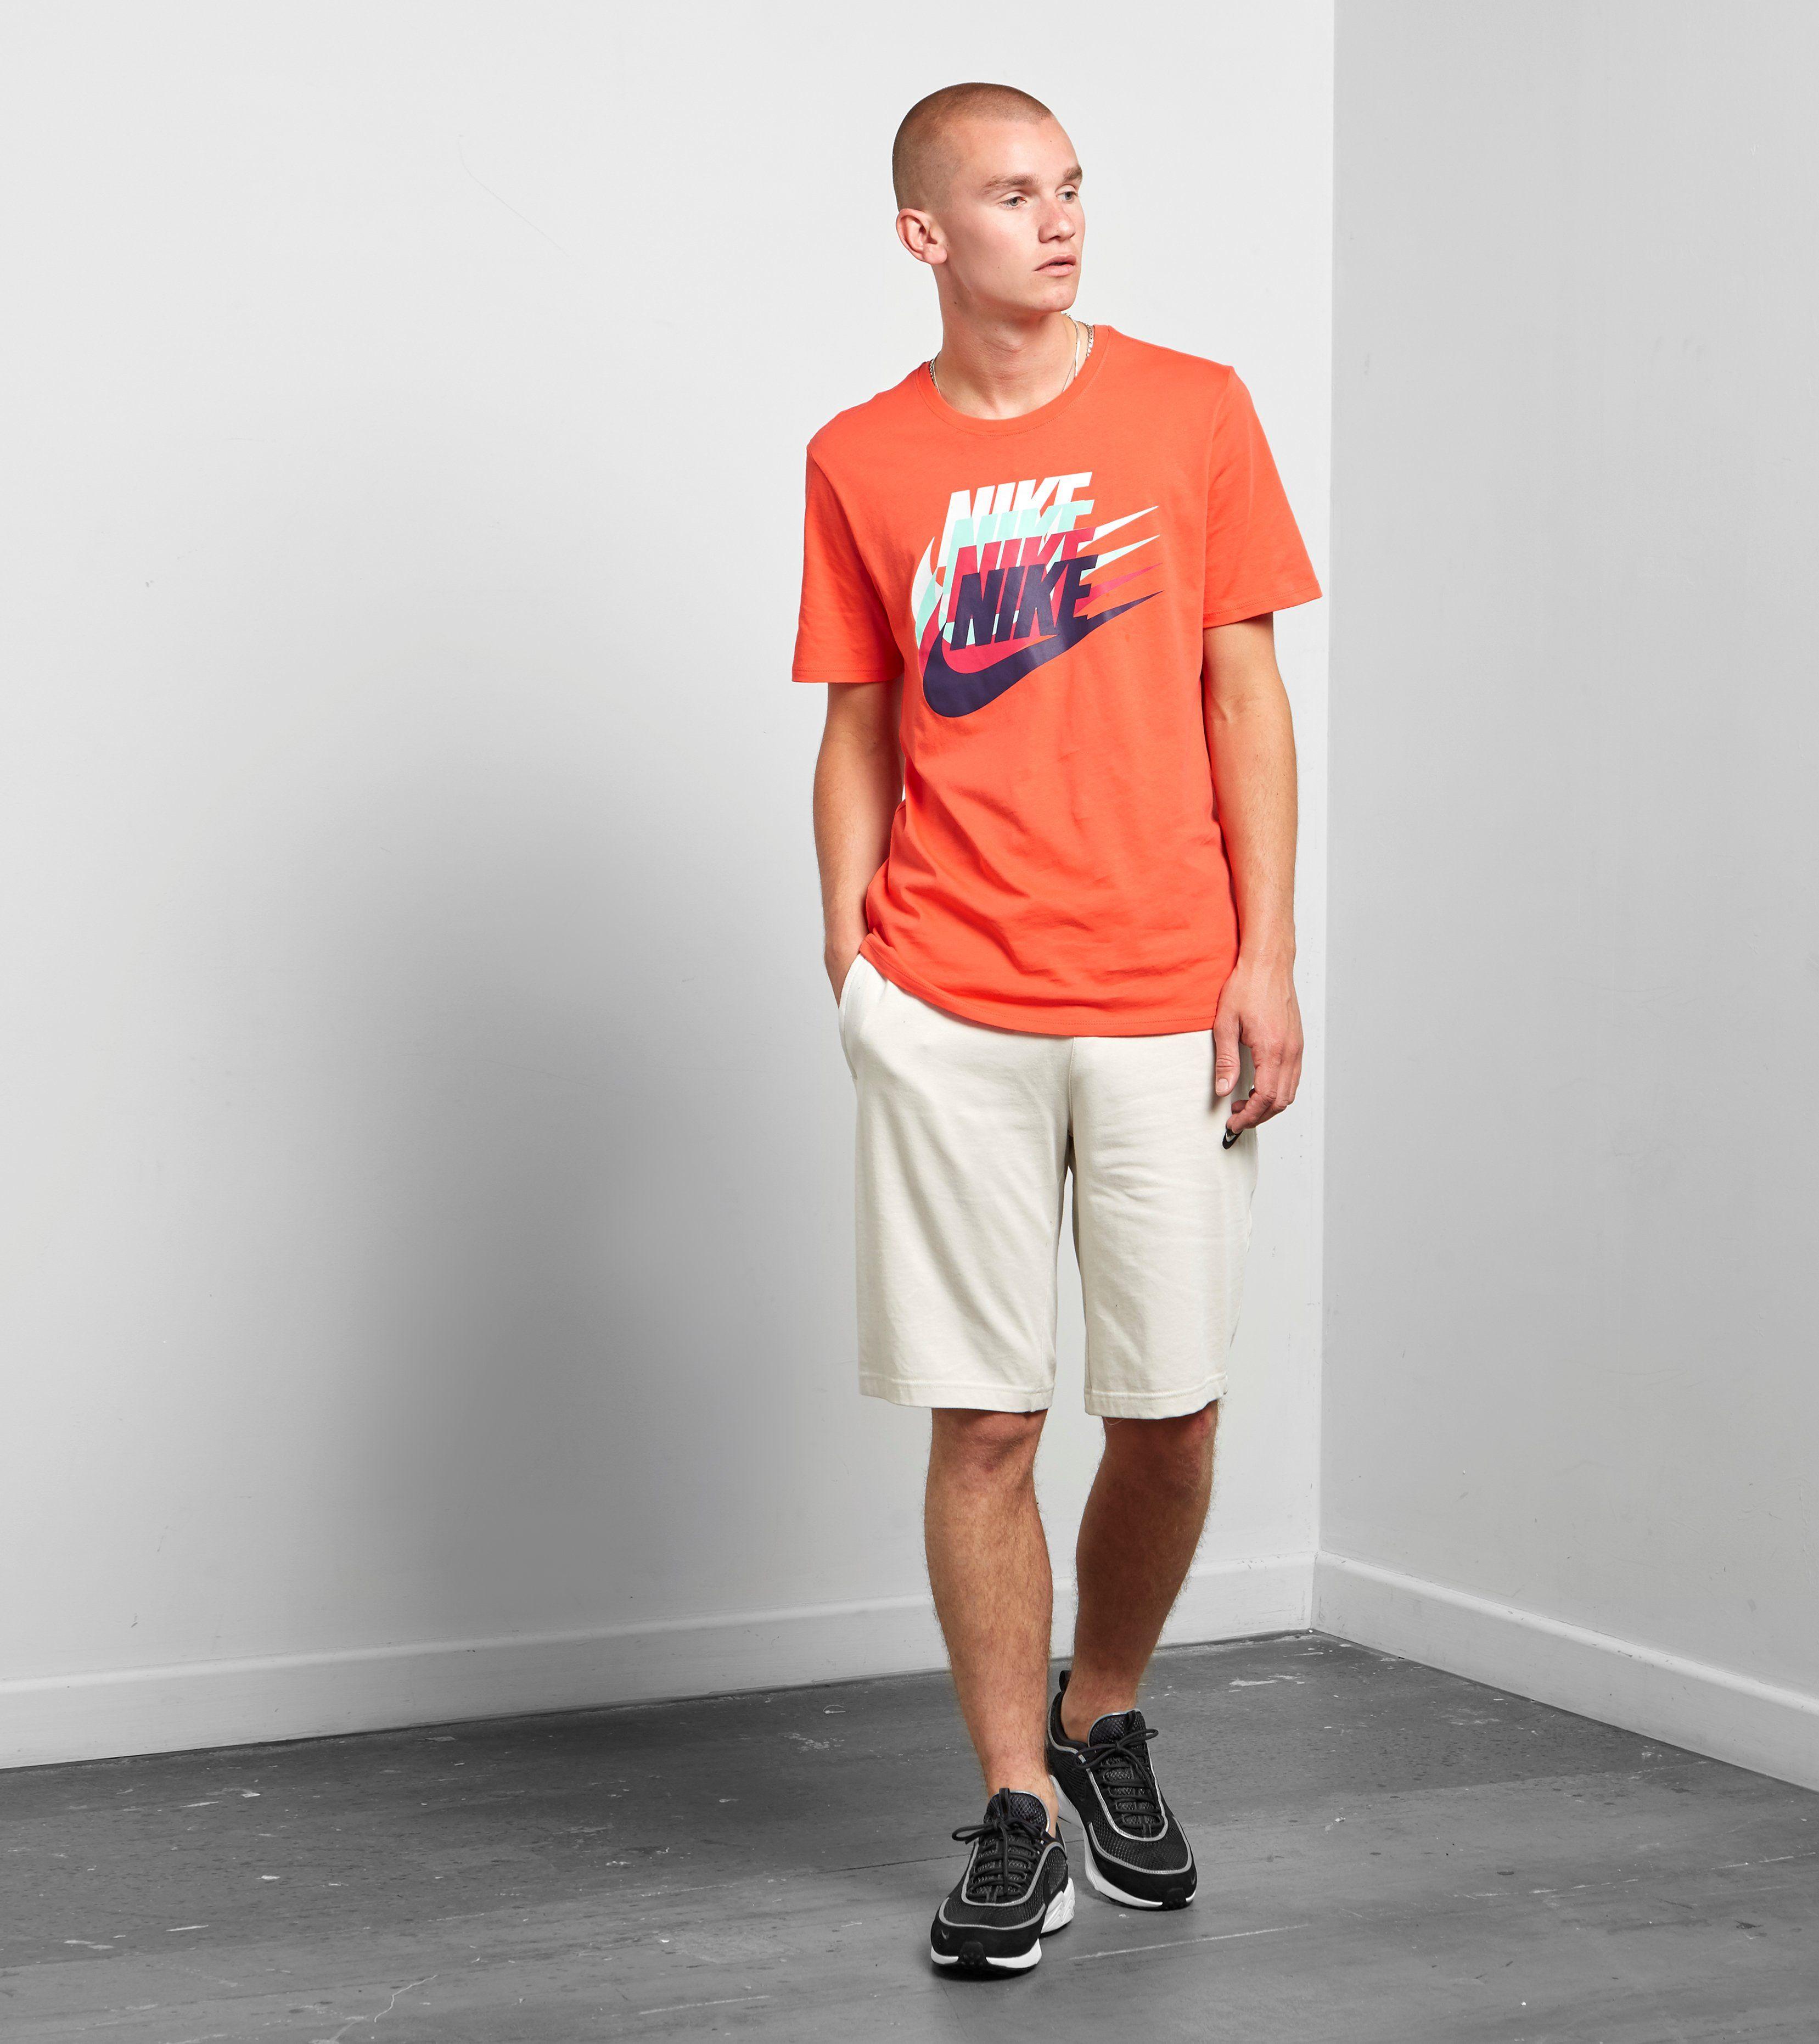 Nike Concept T-Shirt